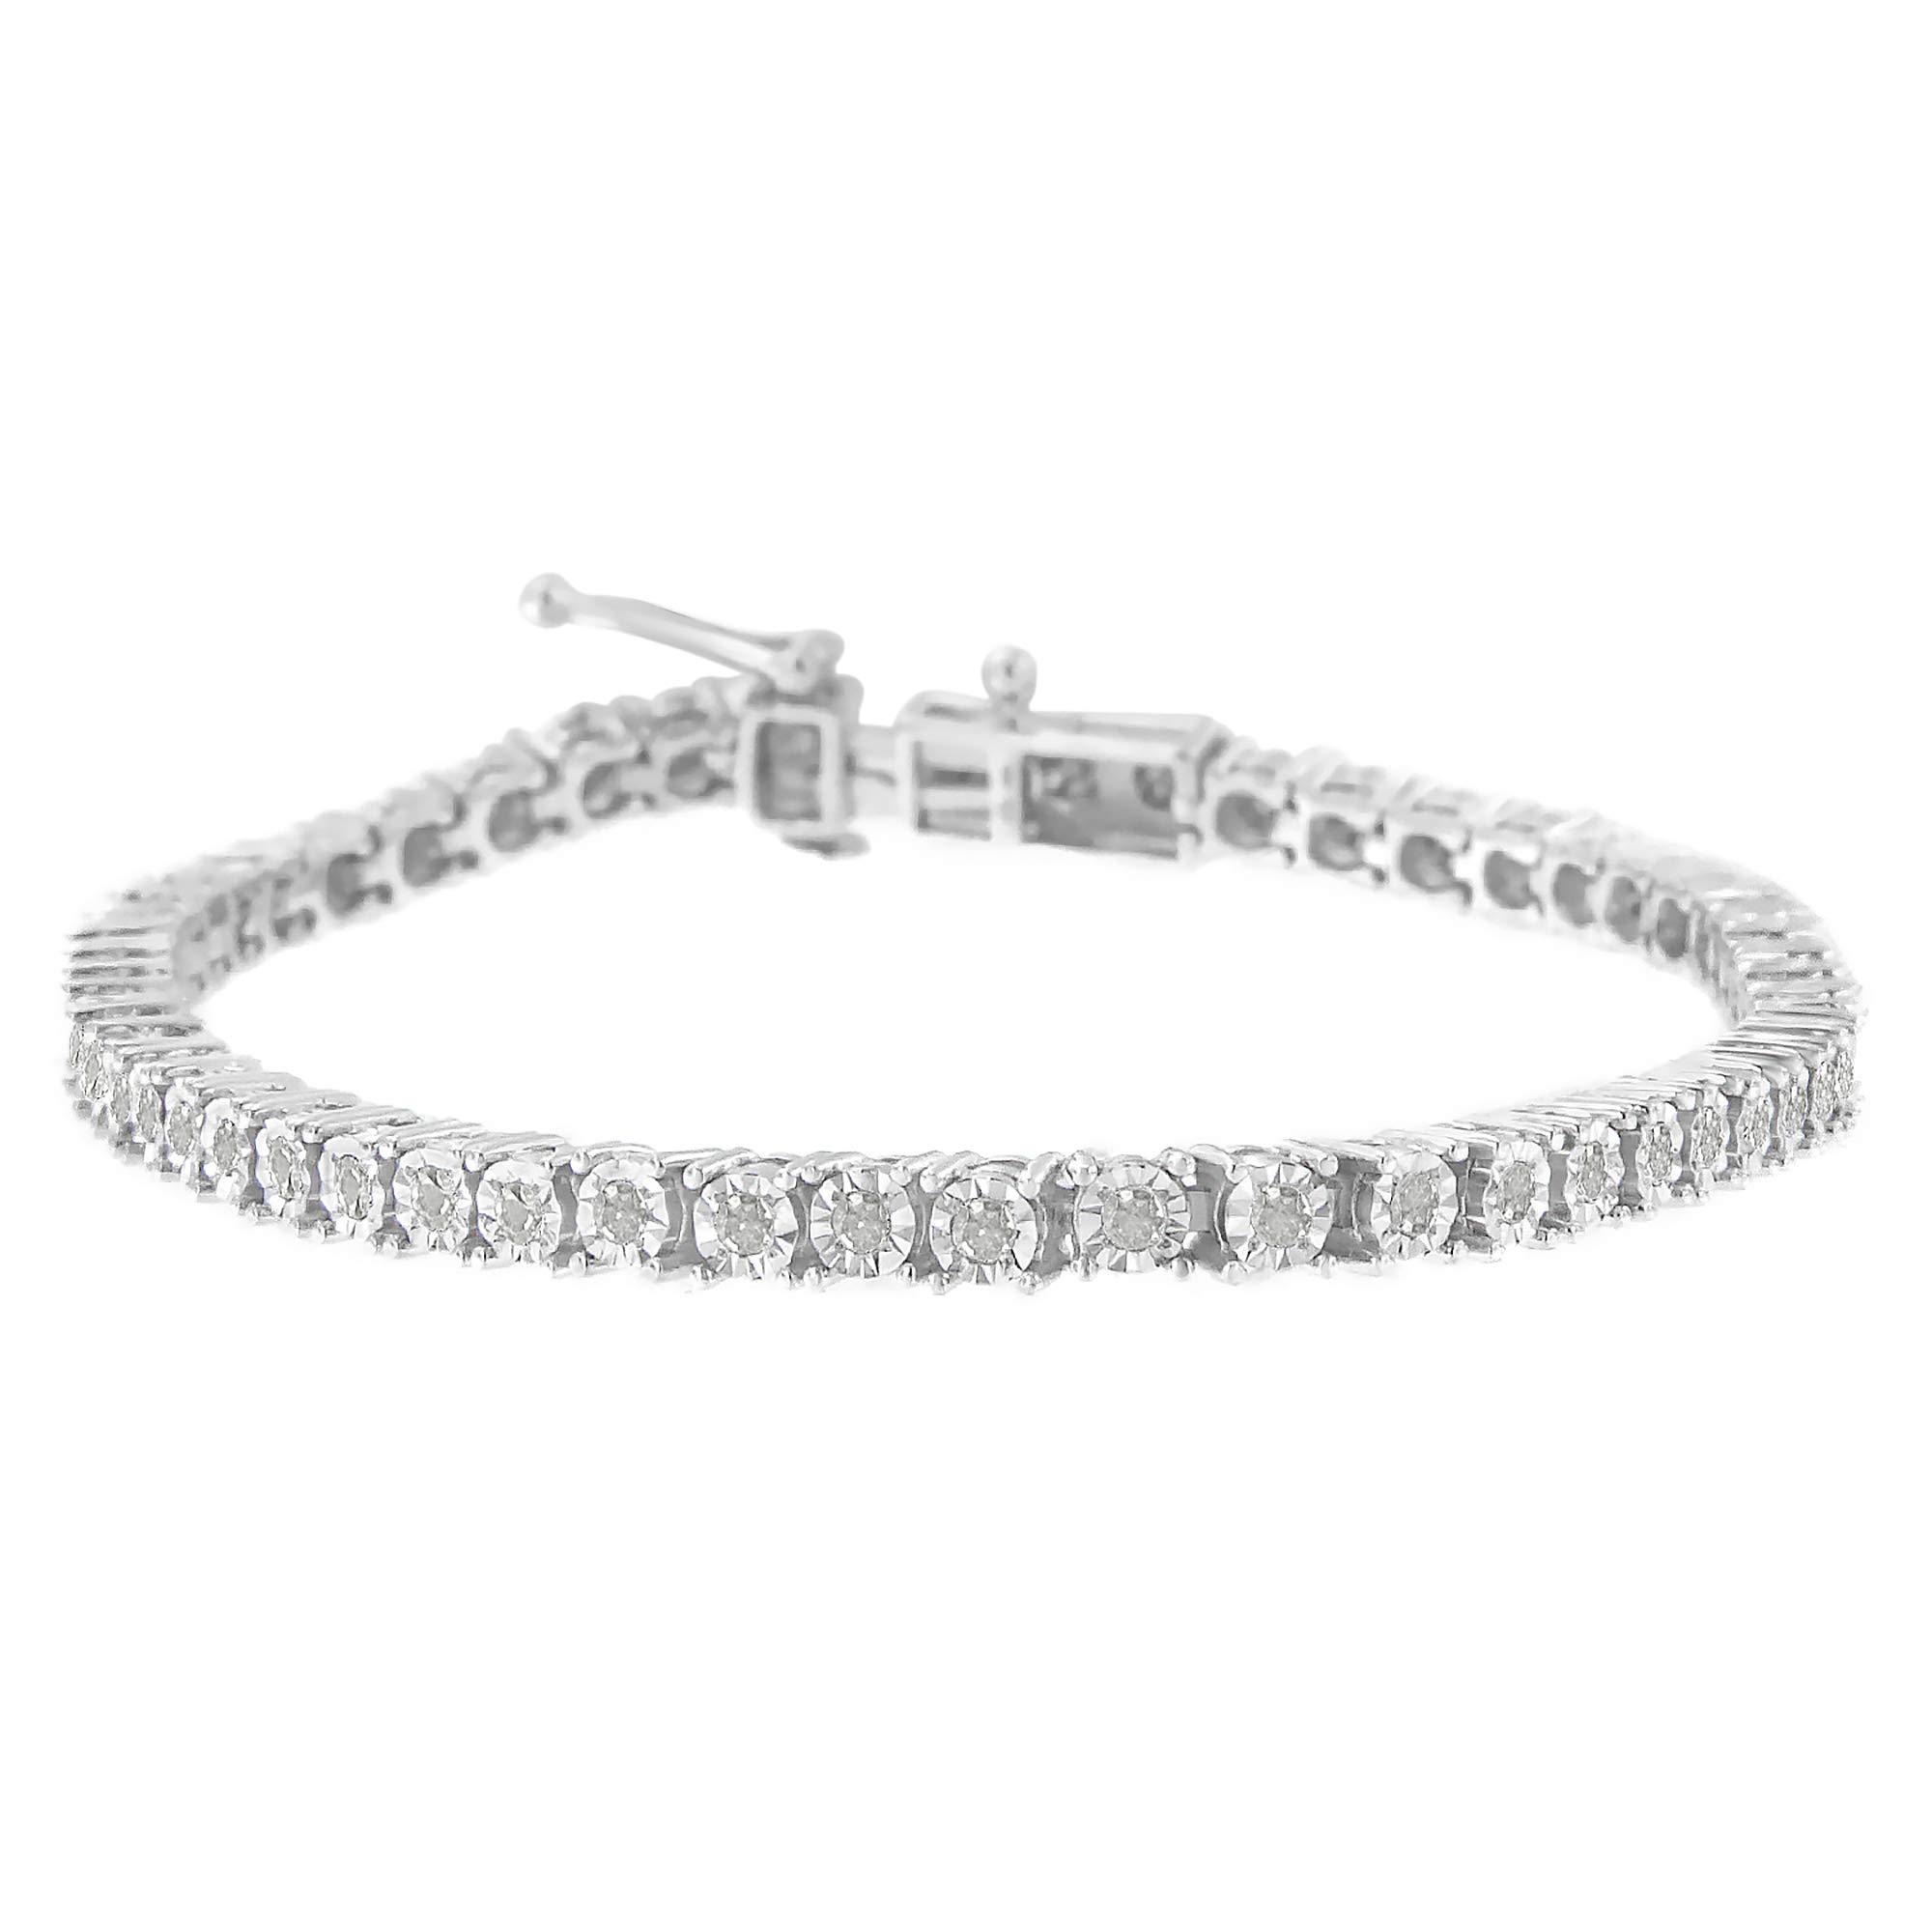 Original Classics Sterling Silver Rose-Cut Diamond Tennis Bracelet (1 cttw, I-J Color, I3-Promo Clarity) by Original Classics